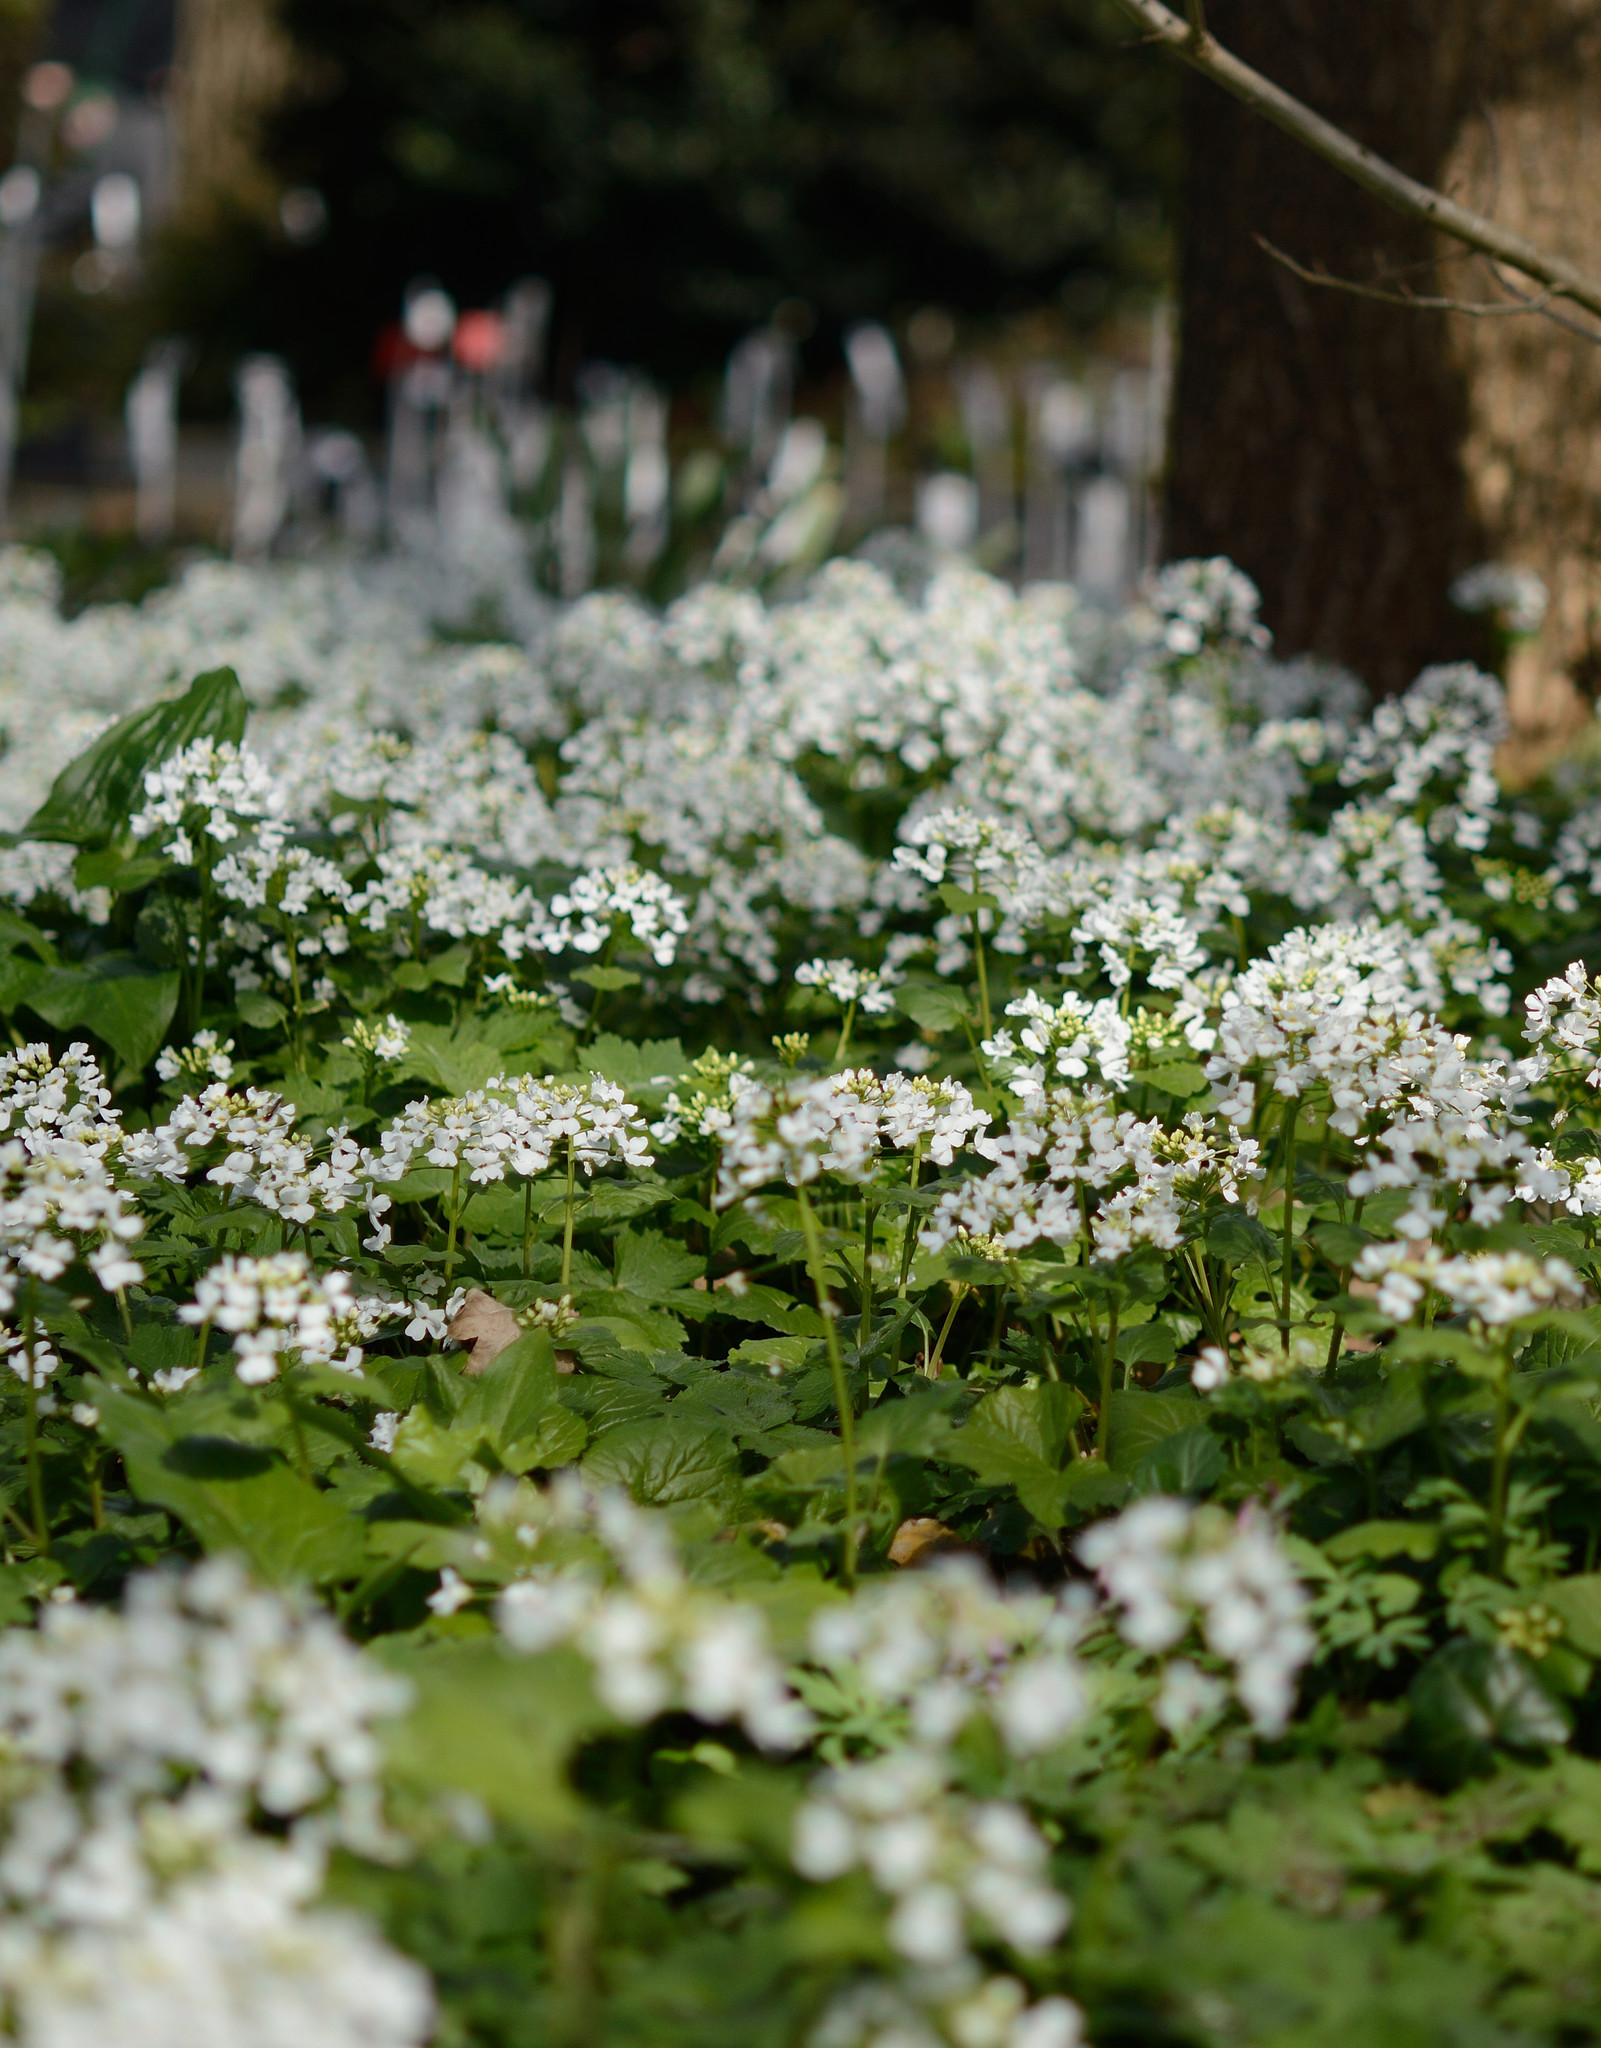 Look (kaukasisch)  Pachyphragma macrophyllum (Kaukasische look)